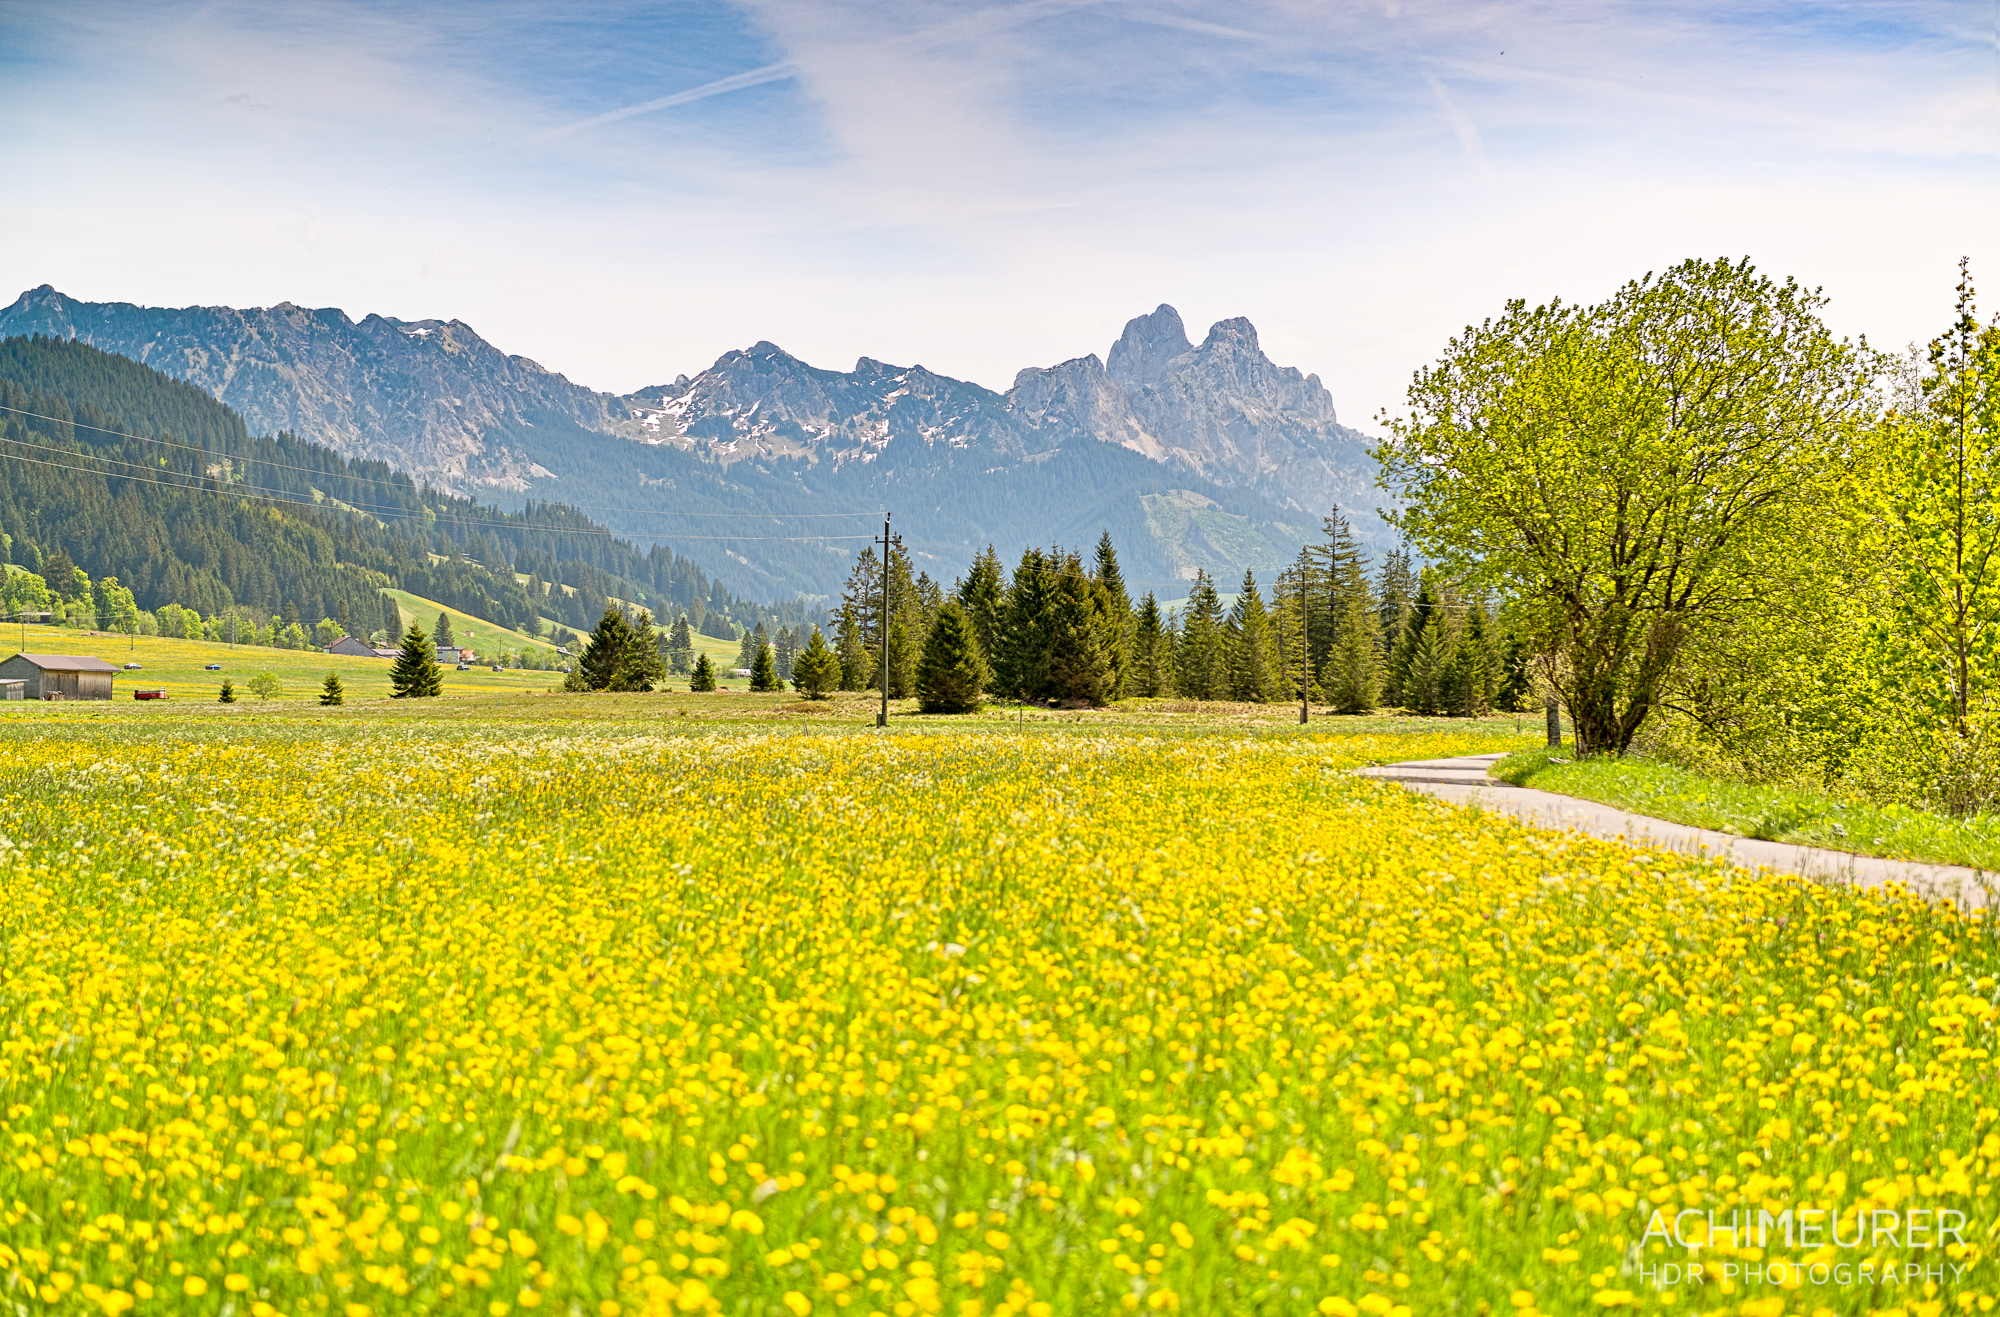 Tannheimer-Tal-Fruehling-Landschaft_2372_1_0_HDR